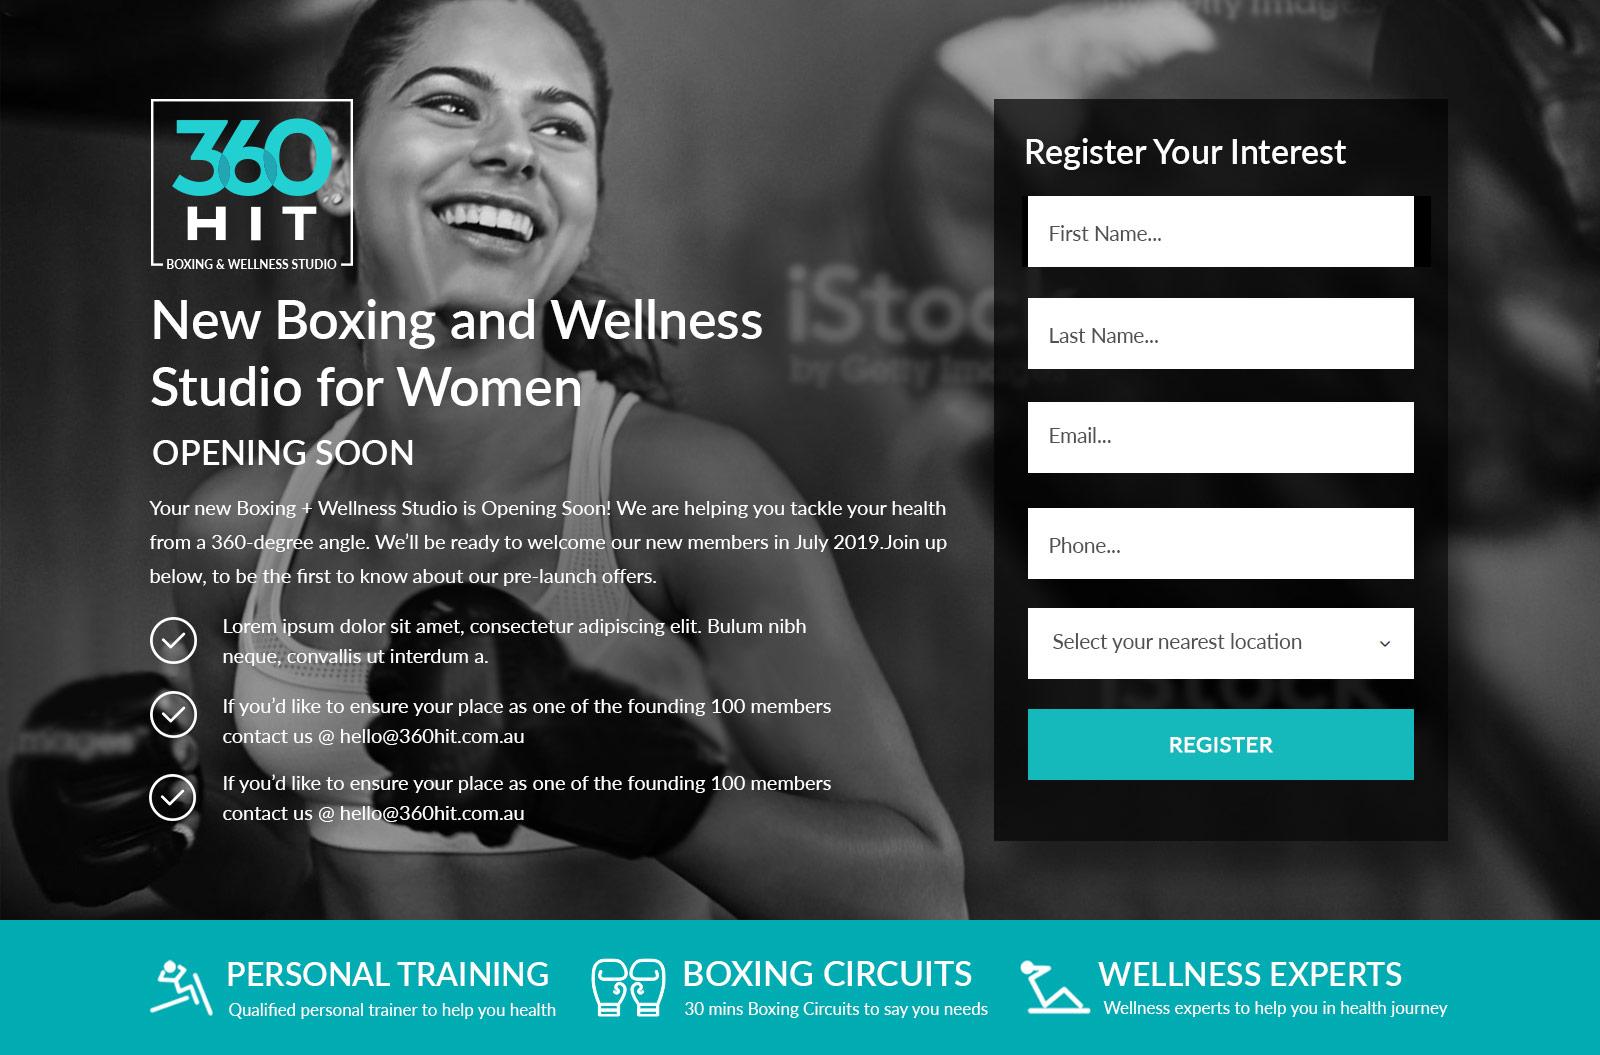 360 hit - boxing and wellness studio